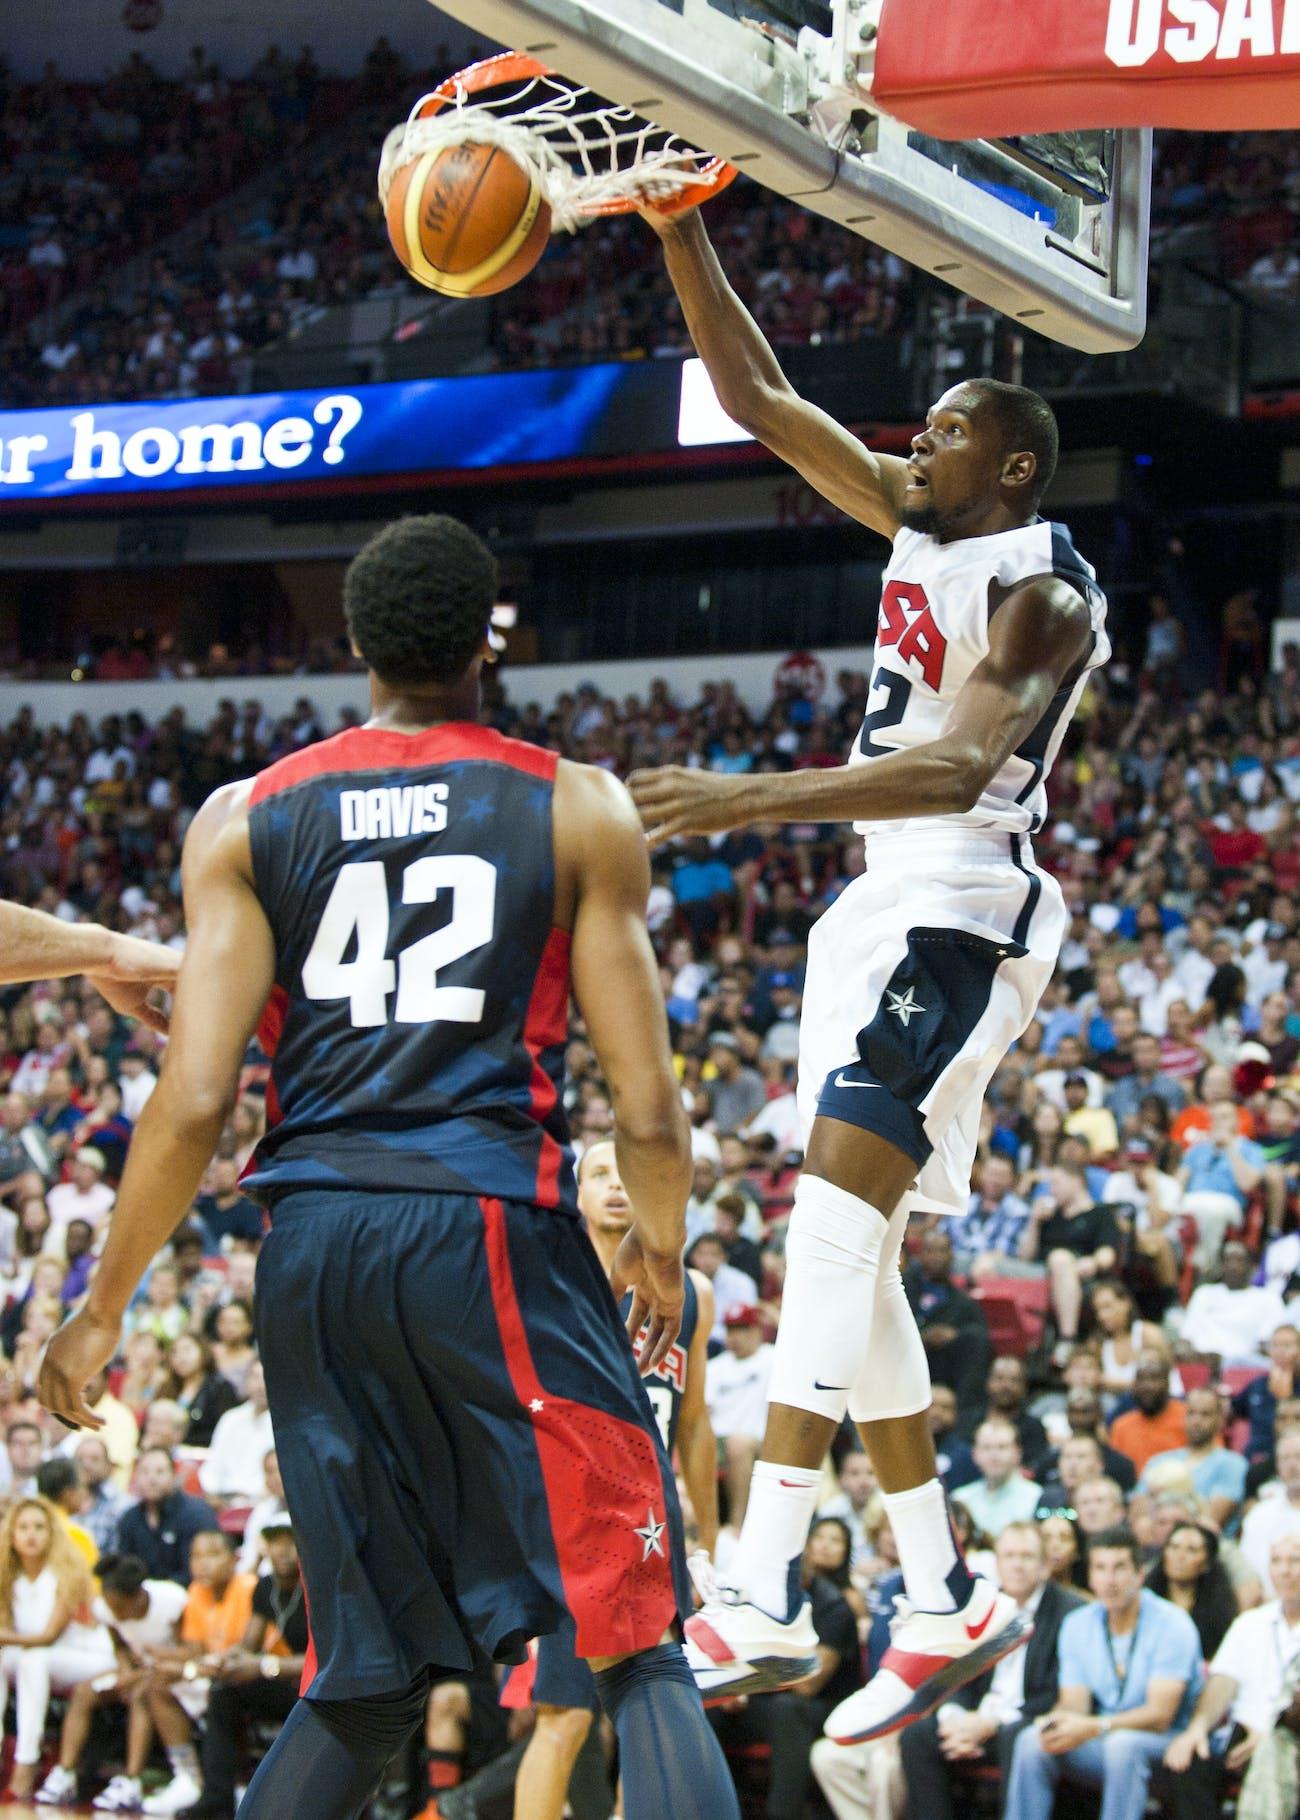 Kevin Durant dunks USA basketball 2015 140801-F-AT963-843